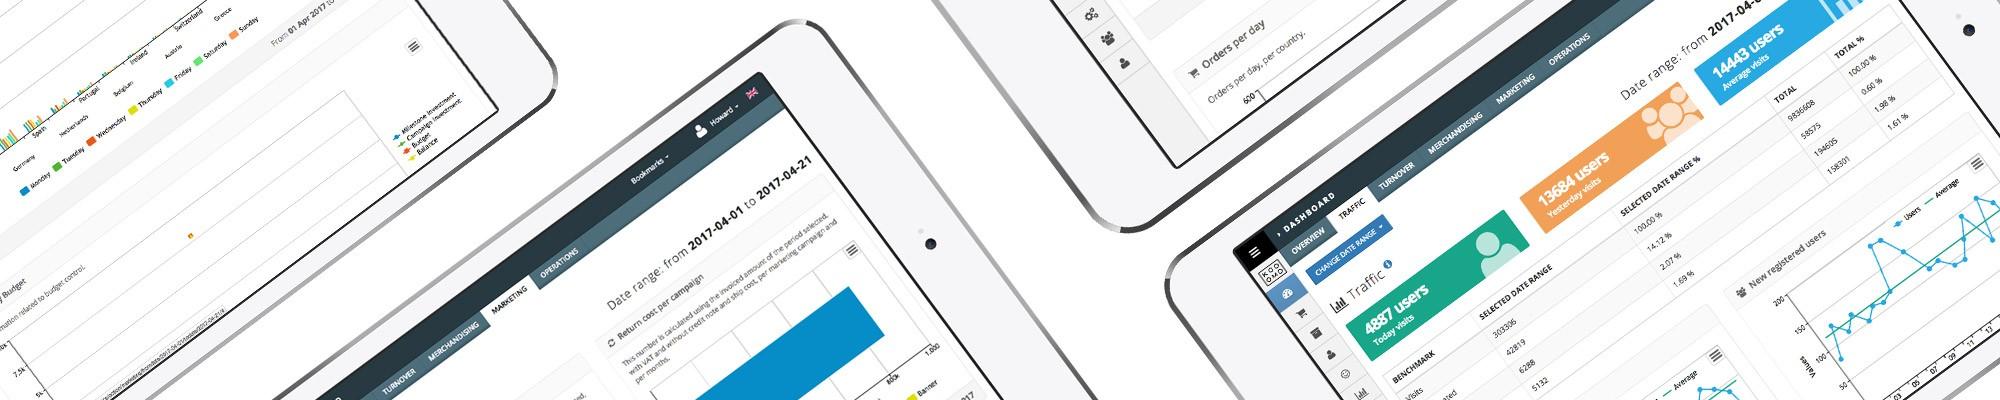 Digital Commerce Features